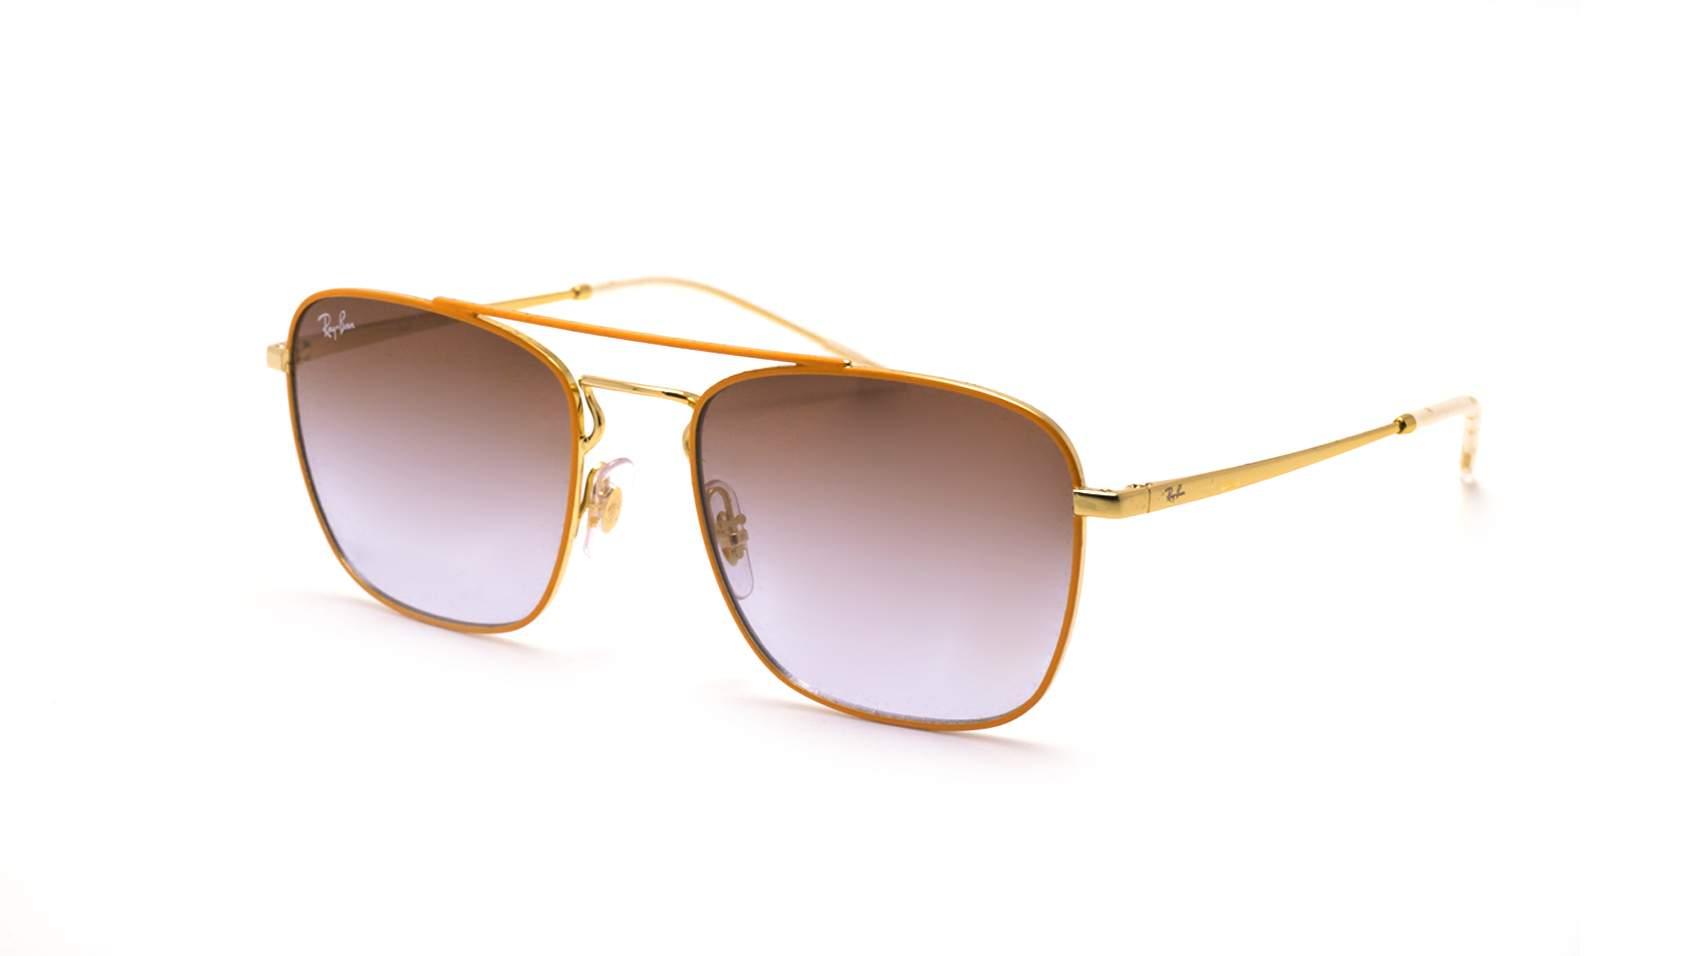 e89072caaf2 Sunglasses Ray-Ban RB3588 90612W 55-19 Orange Medium Gradient